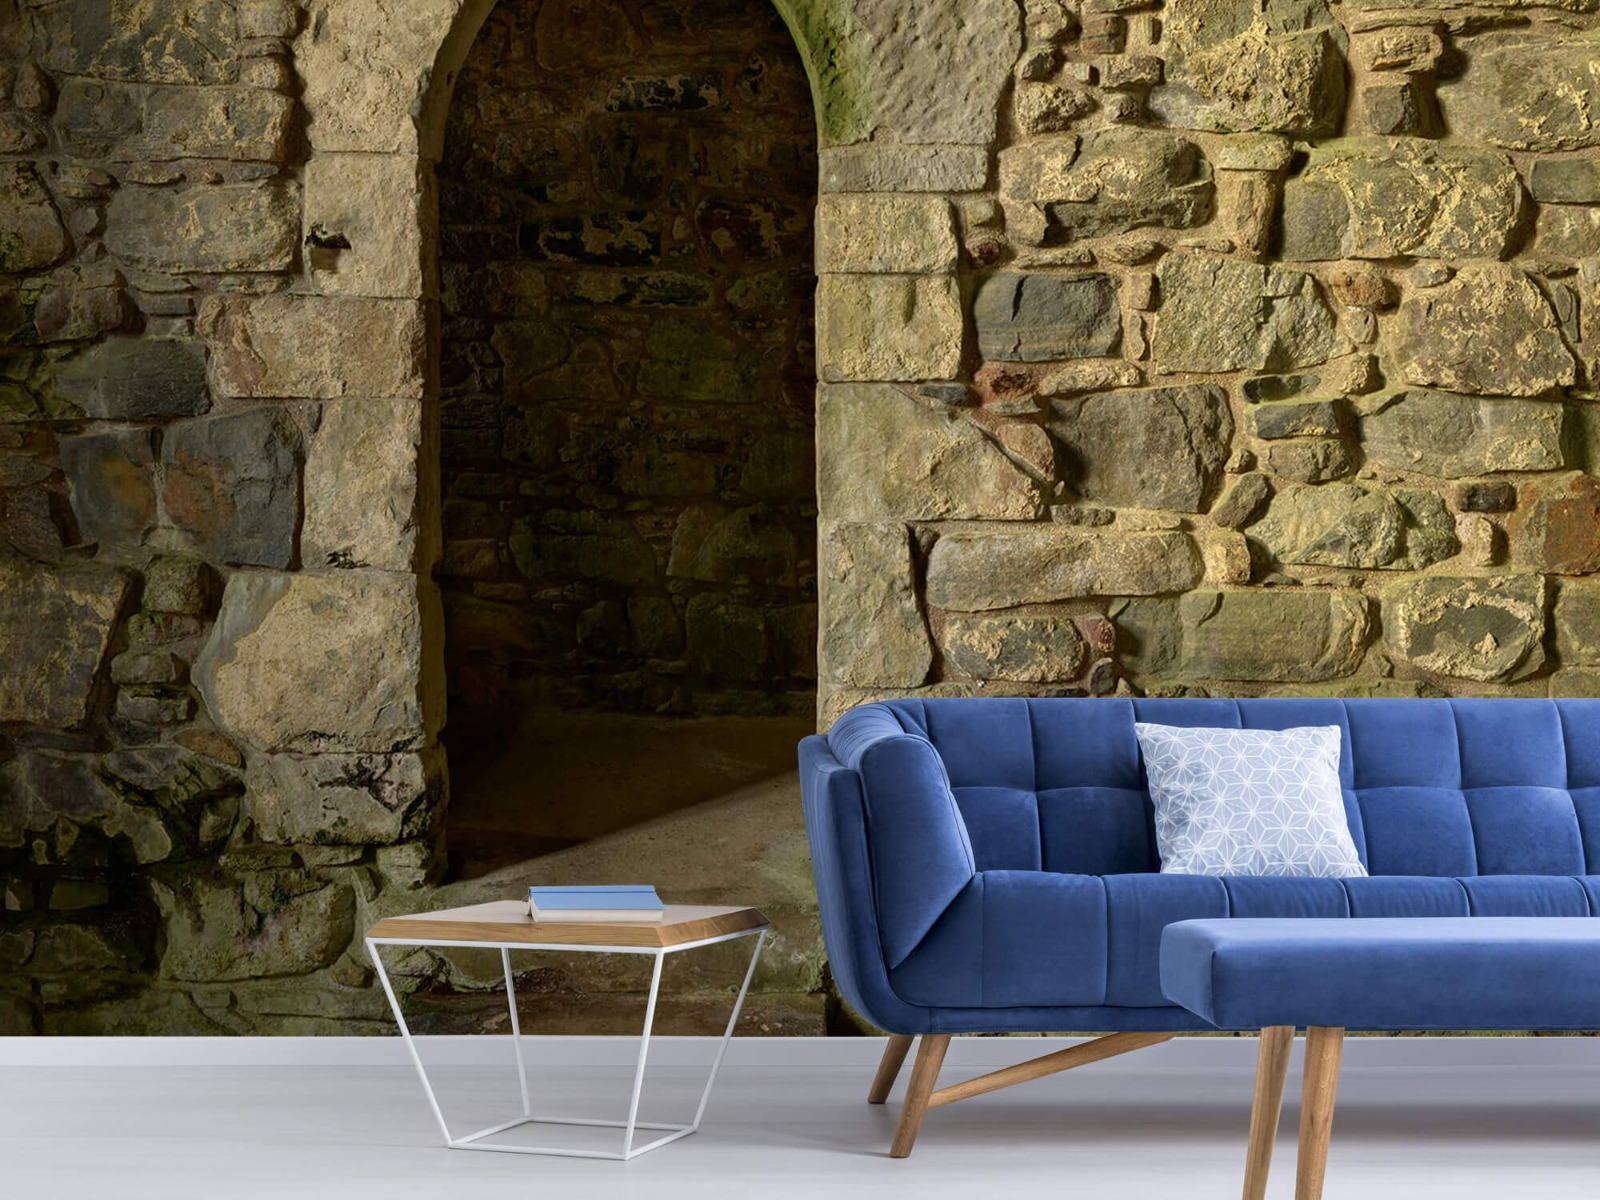 Steen behang - Oude muur met doorgang - Slaapkamer 5